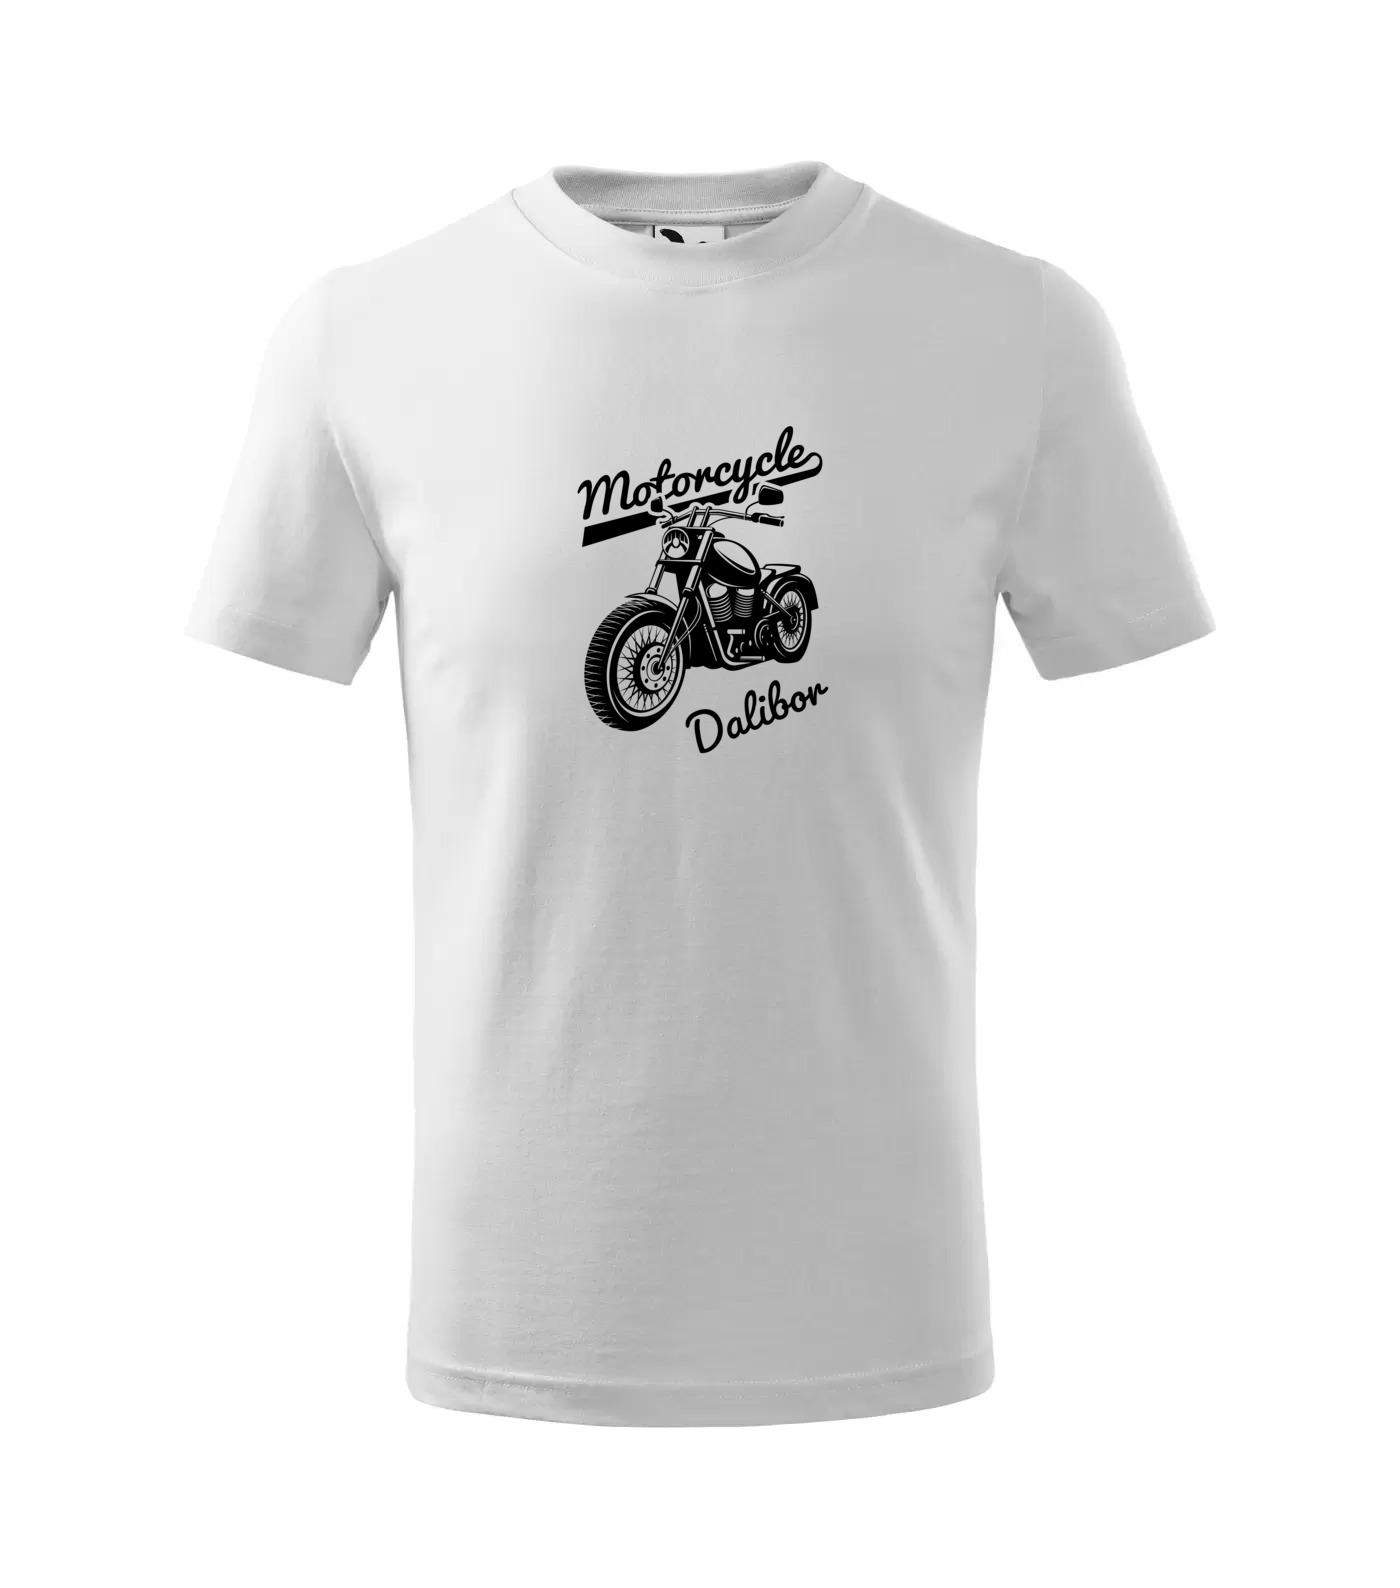 Tričko Motorkář Inverse Dalibor